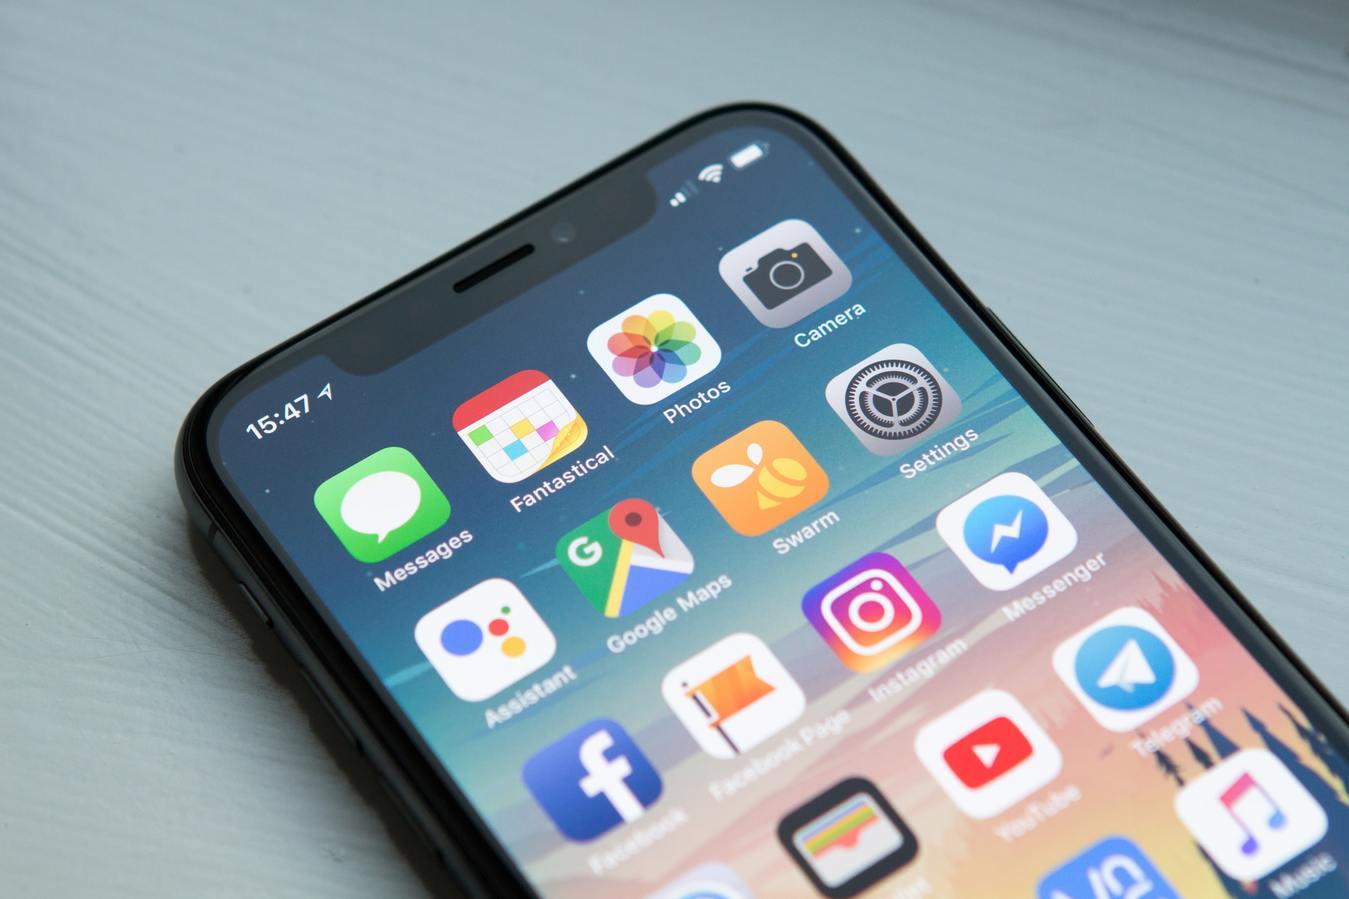 экран iPhone с приложениями